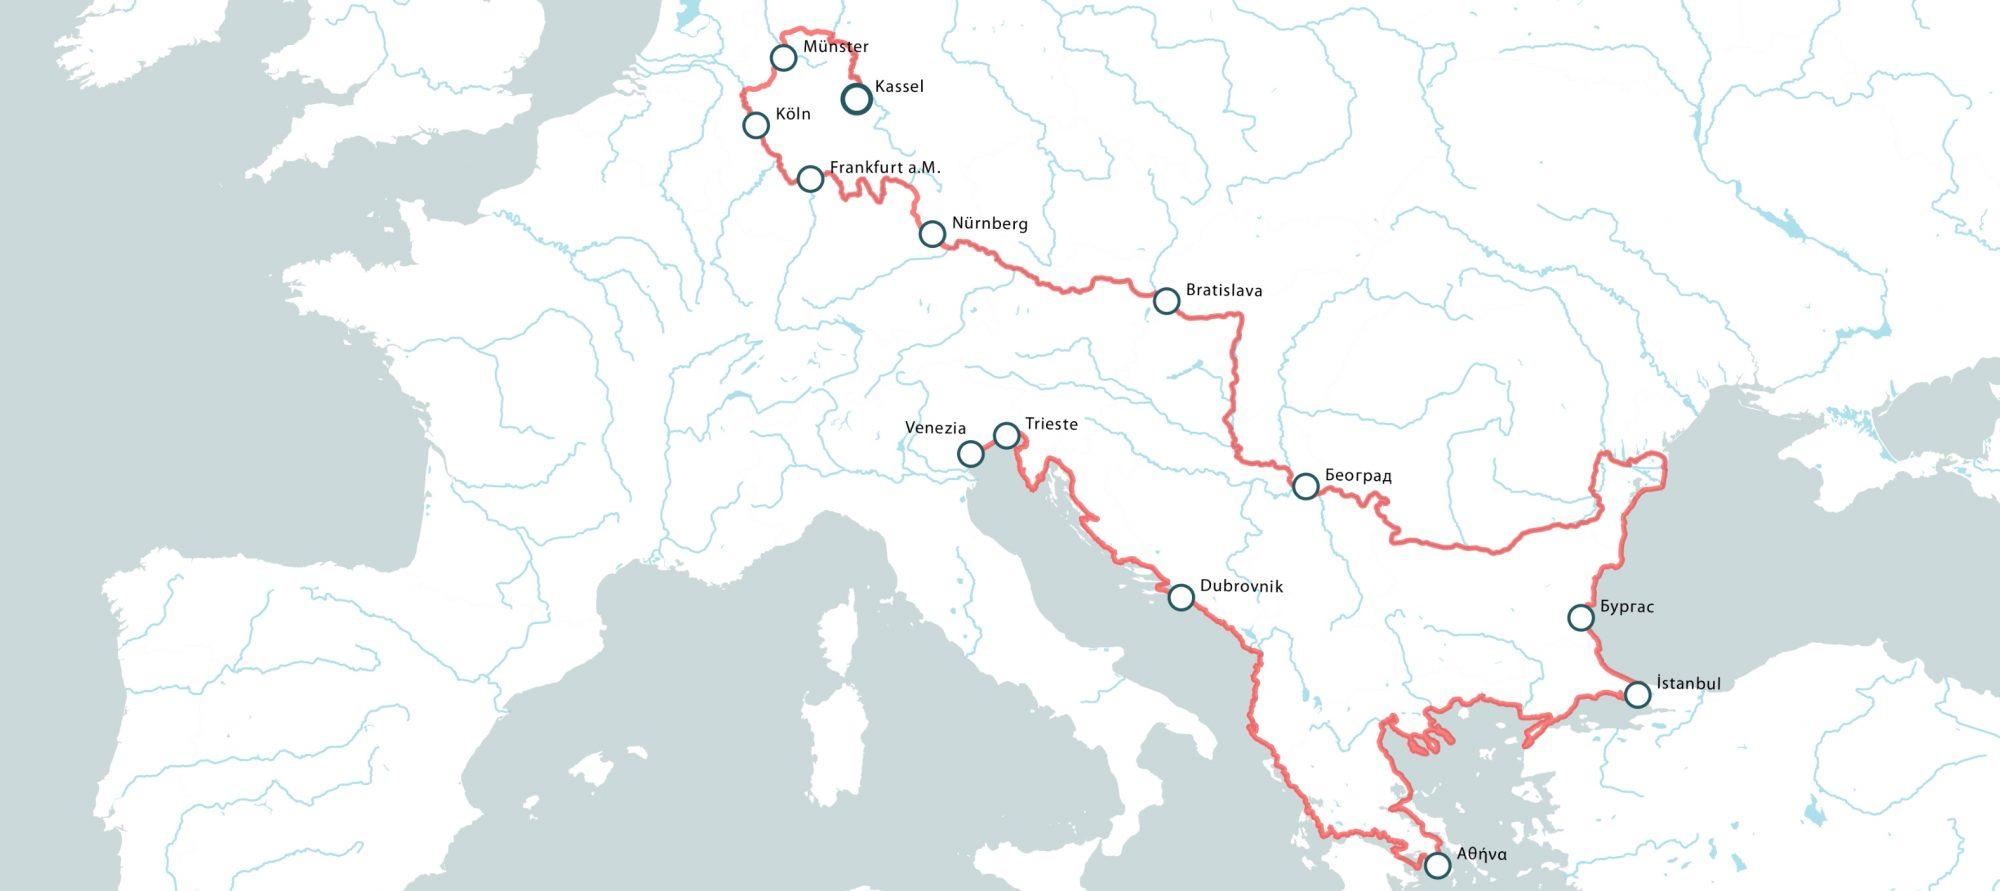 INO - Looting Europe